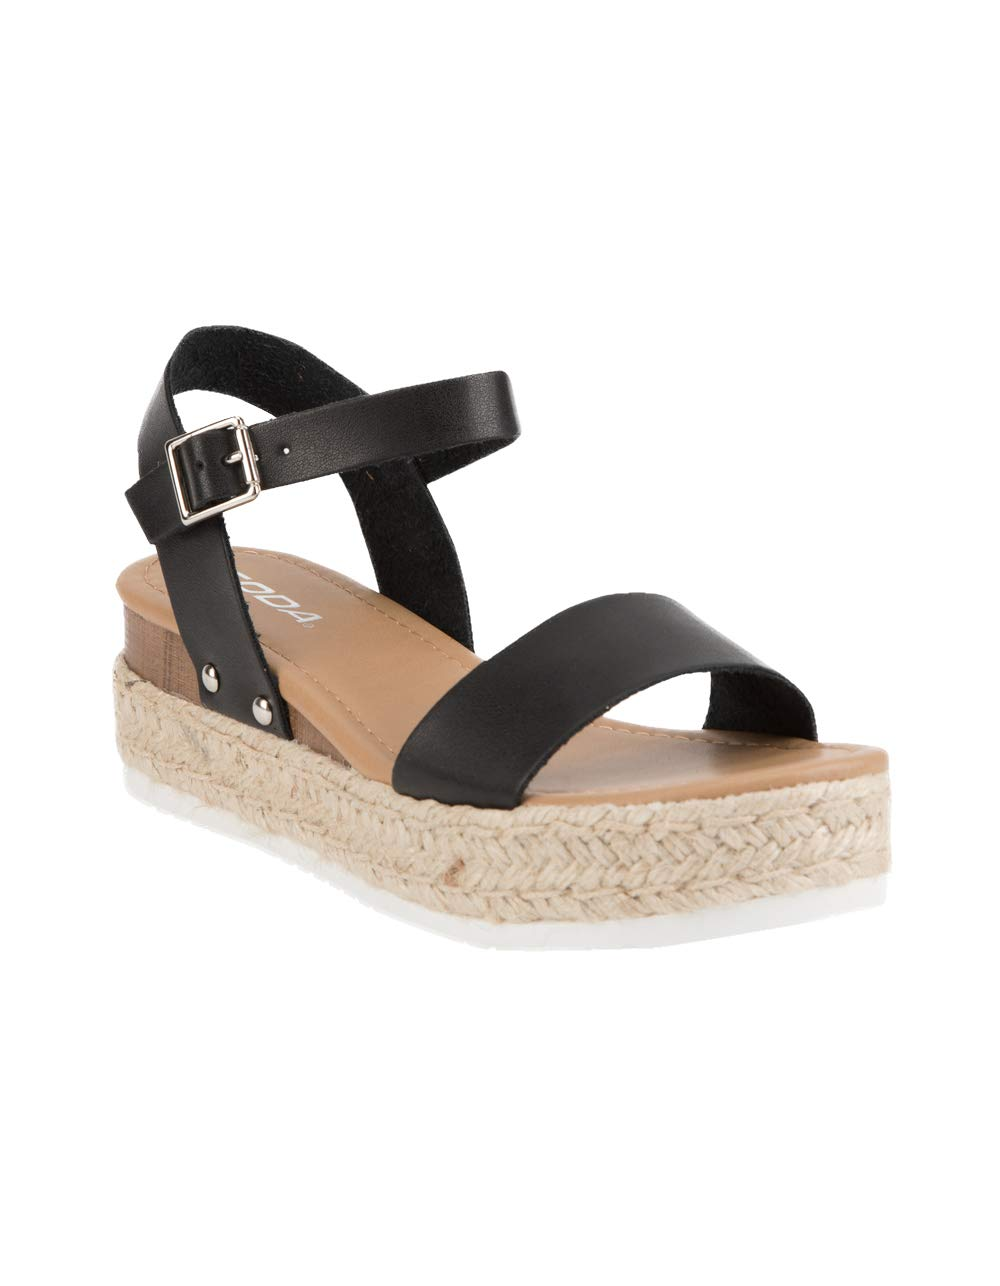 SODA Clip Tan Espadrille Flatform Sandals (5.5 M US, Black)